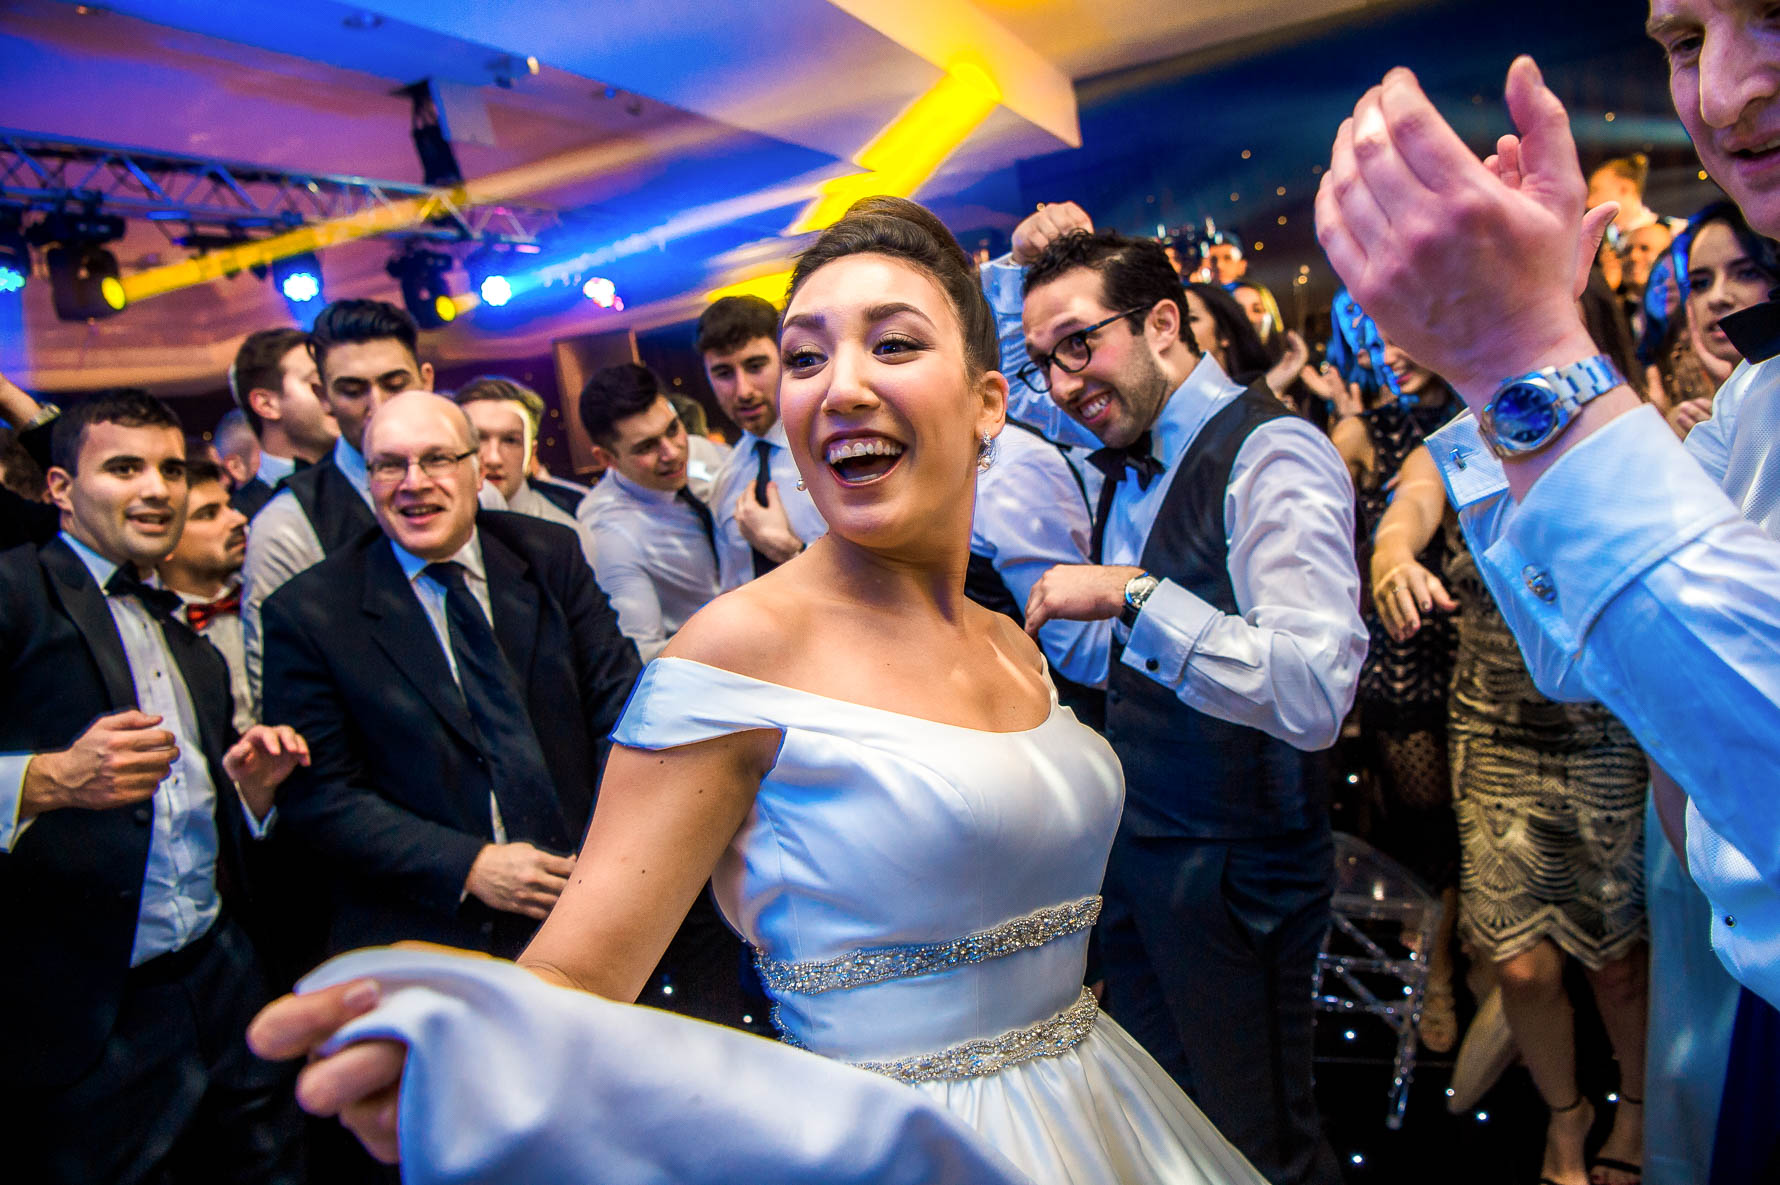 Gilev wedding party manchester